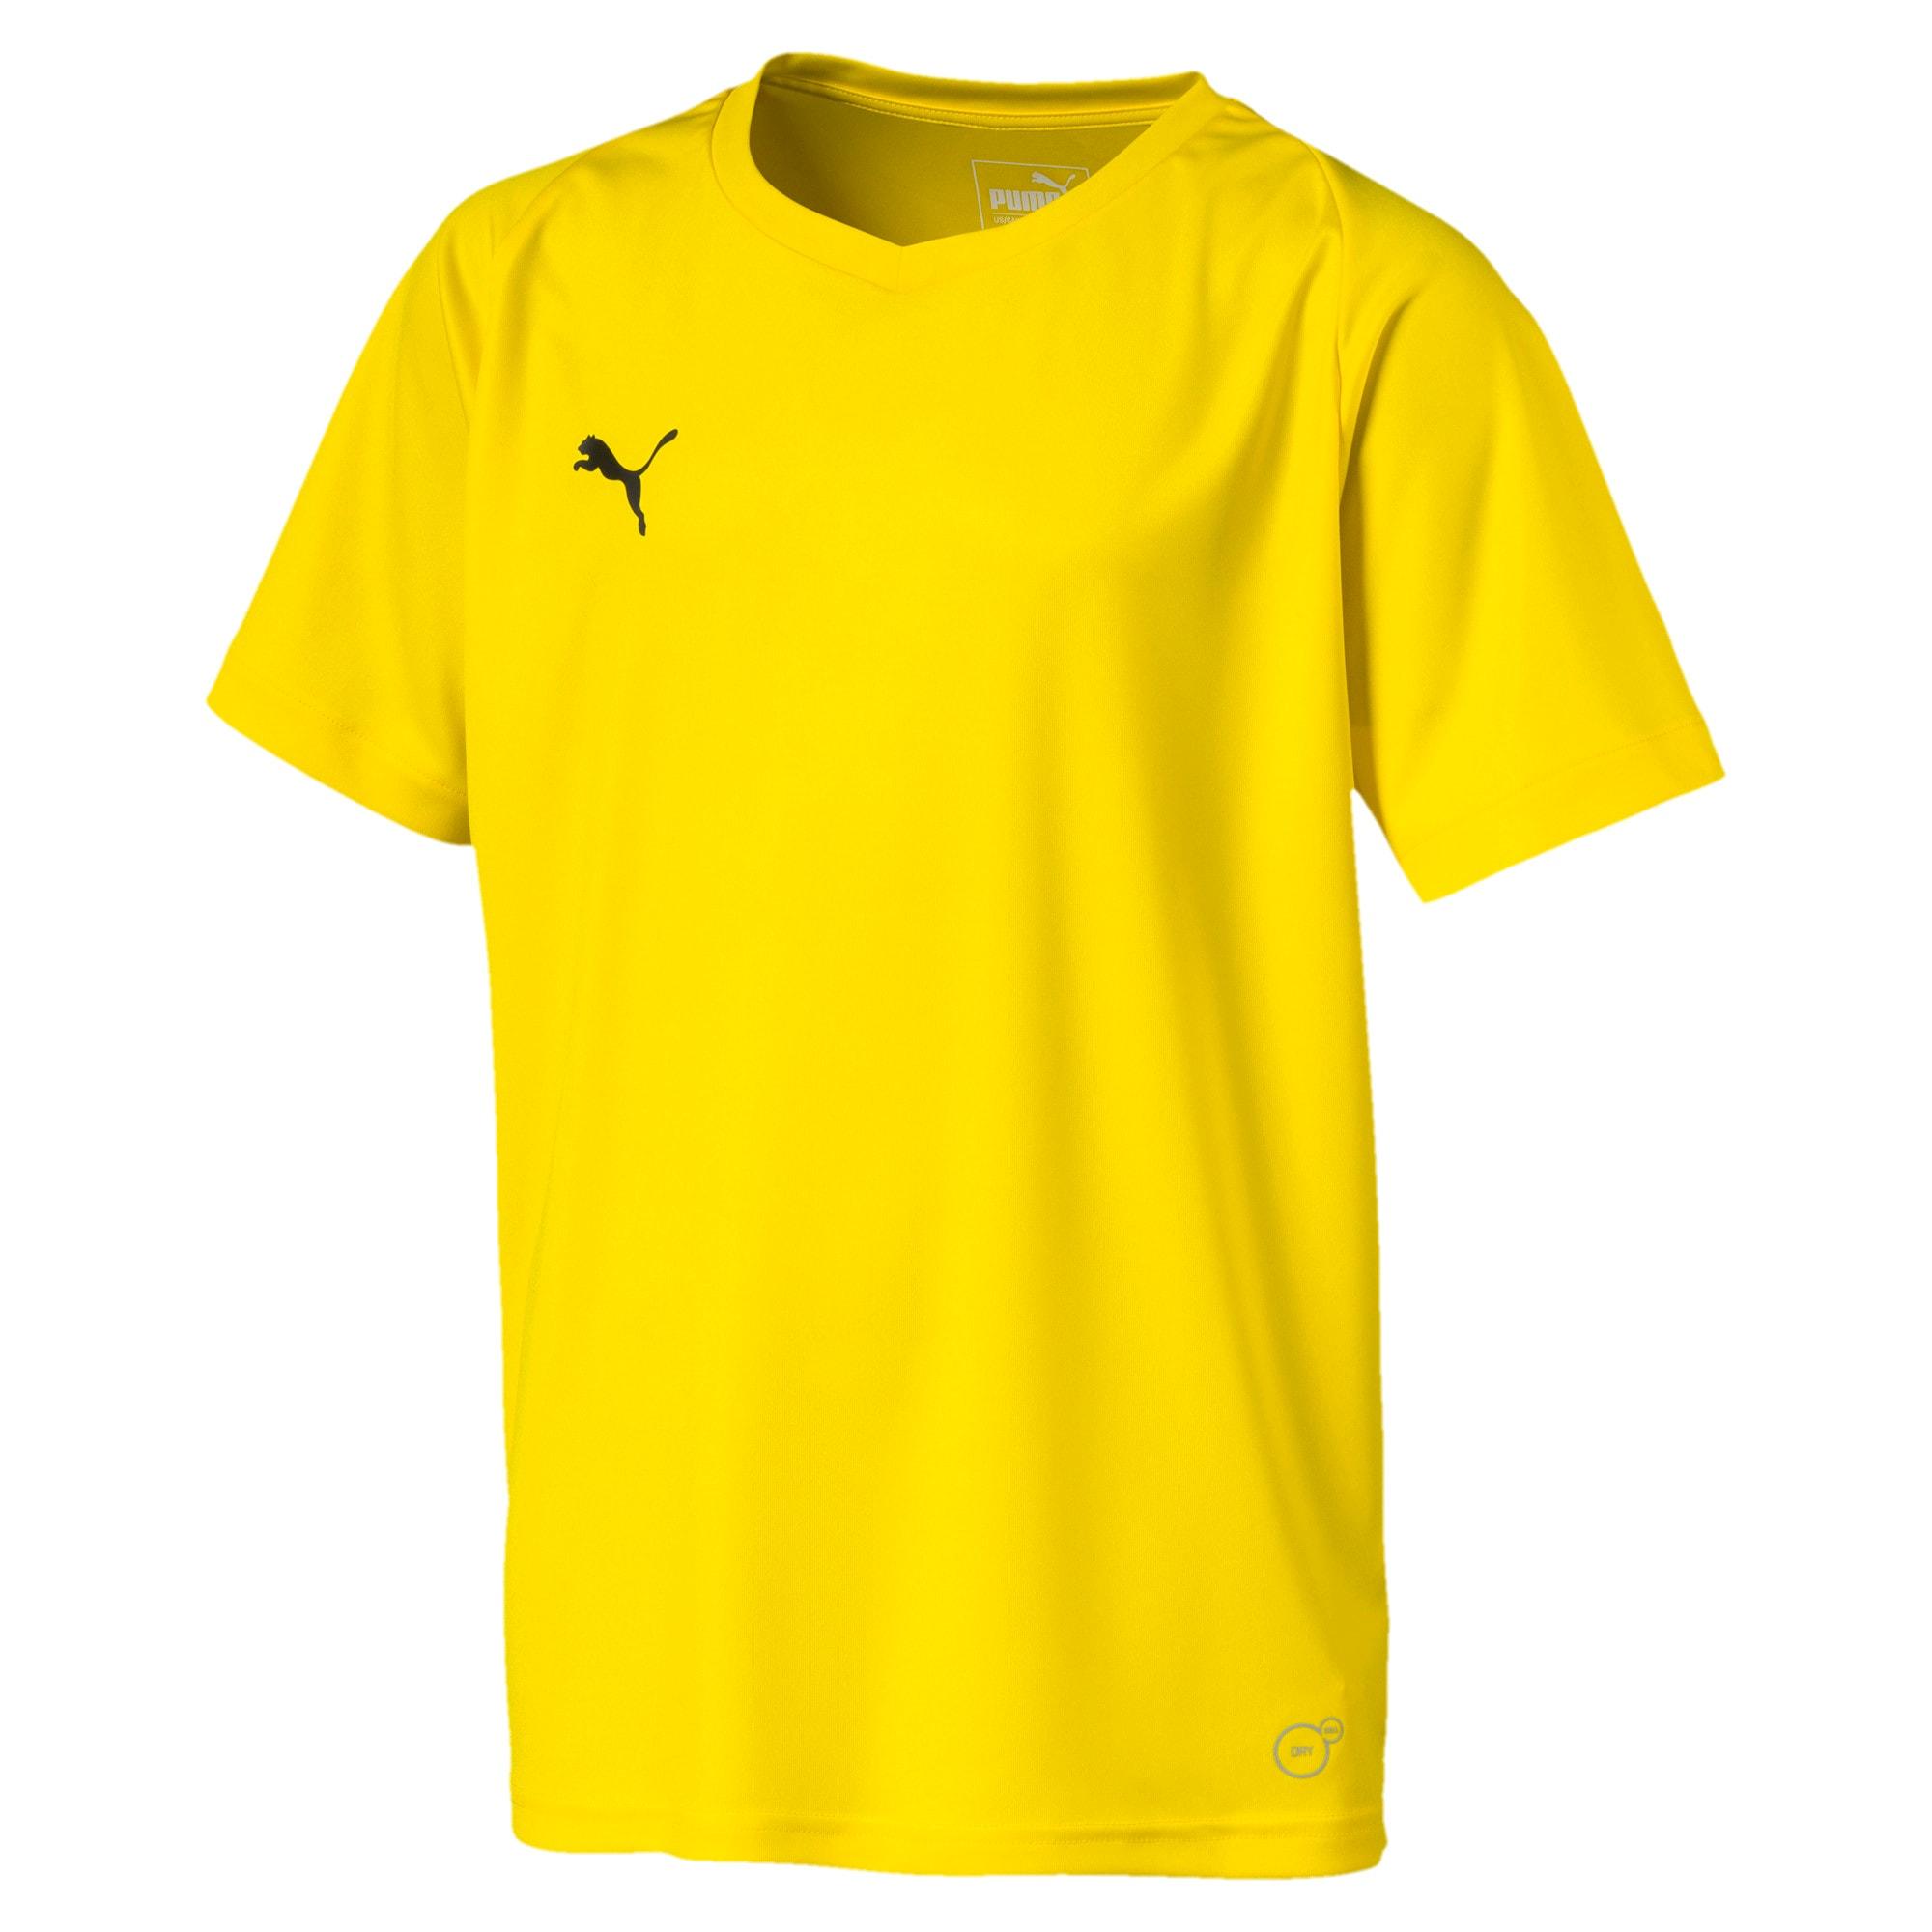 Thumbnail 1 of Maillot Football LIGA Core pour enfant, Cyber Yellow-Puma Black, medium